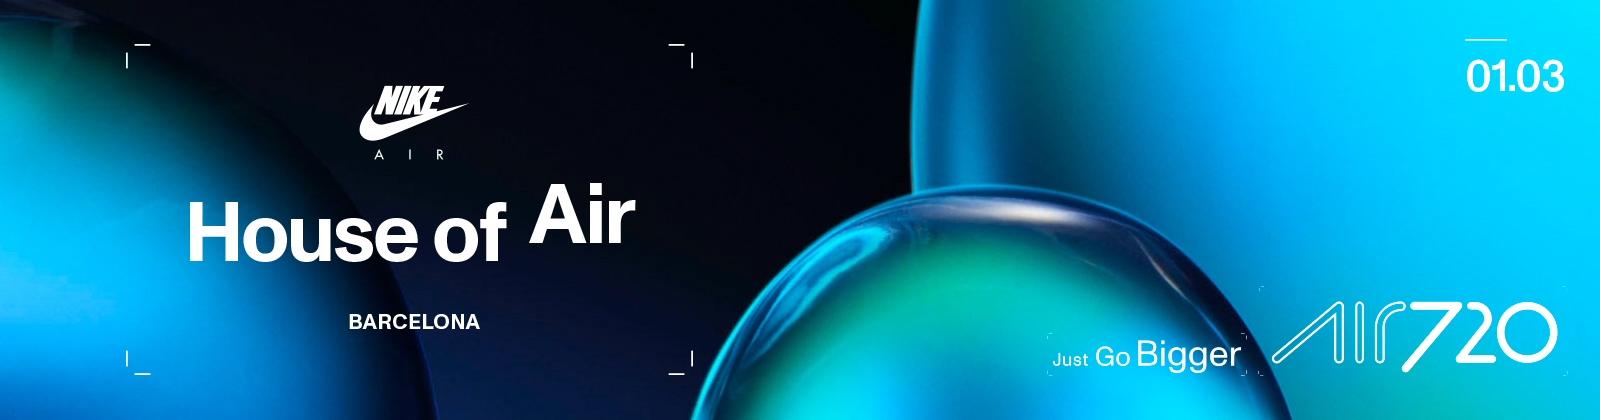 Oferta terminar Manto  House of Air | Nike